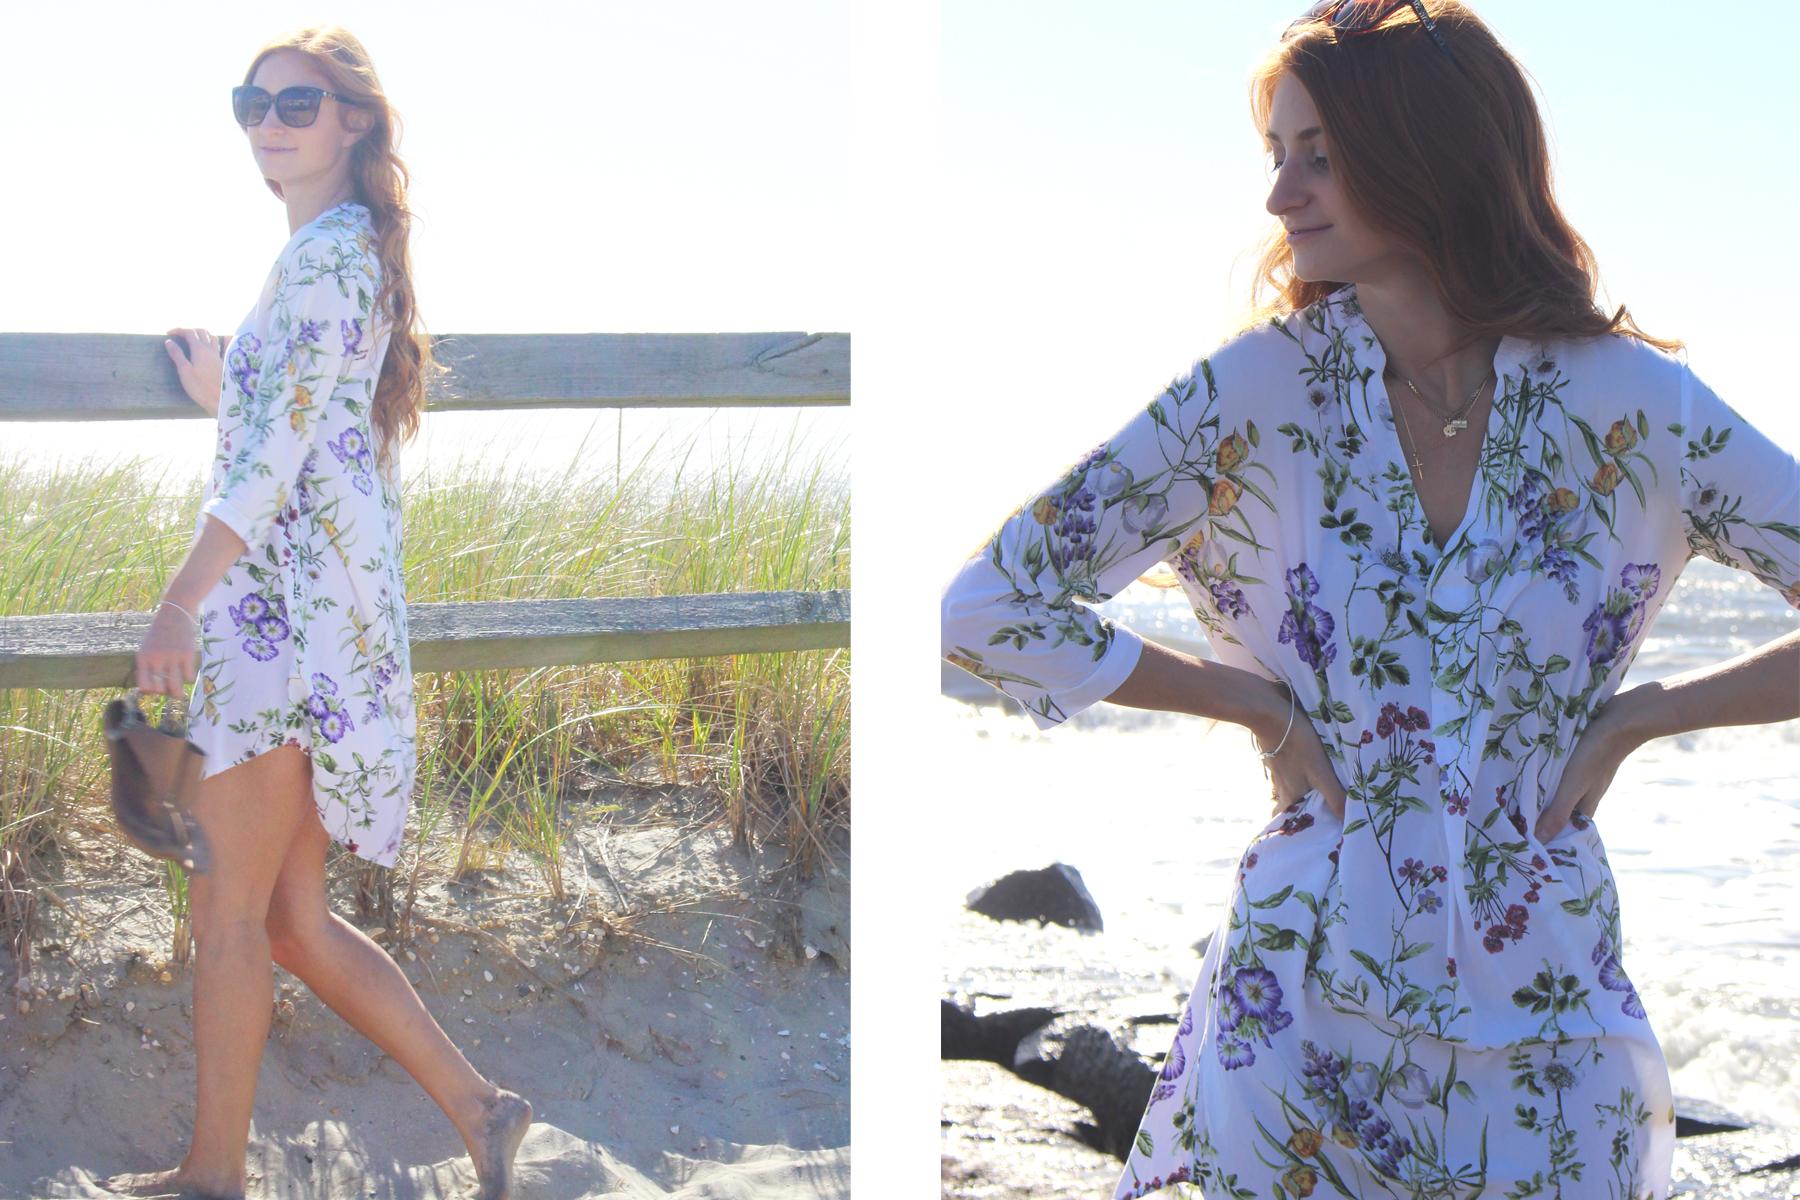 Redhead girl at beach in floral H&M dress